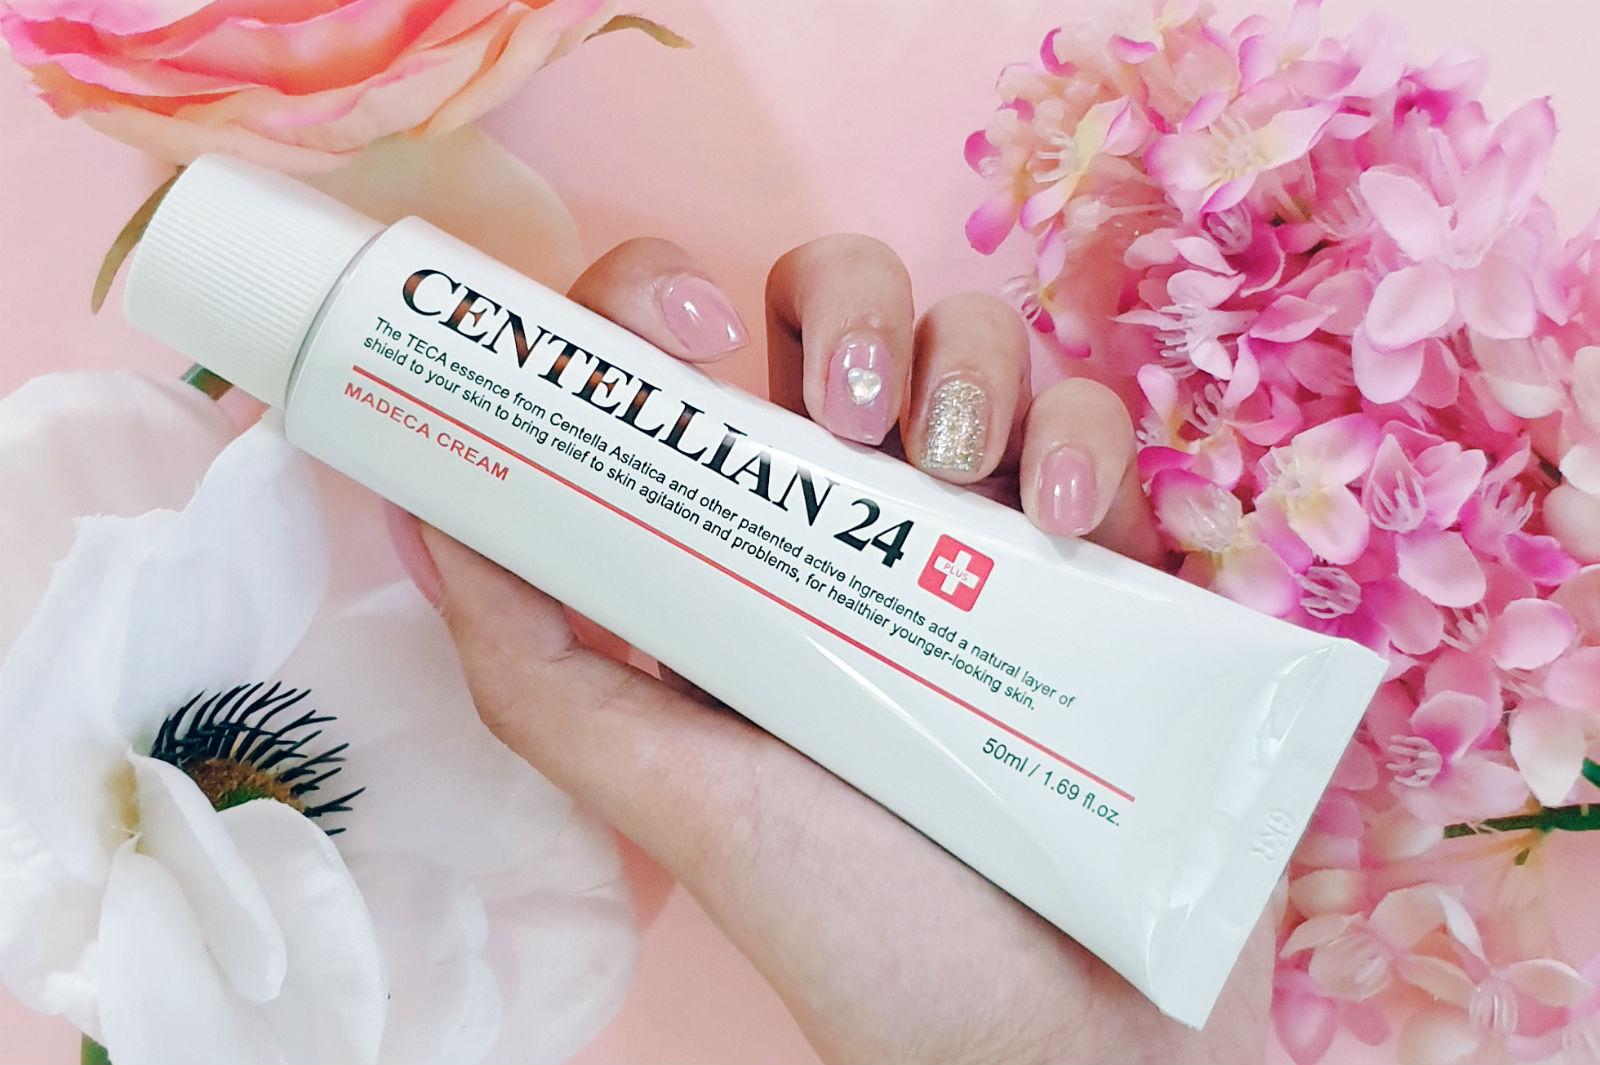 Centellian 24 Madeca Derma Cream Review Unpopular Opinion